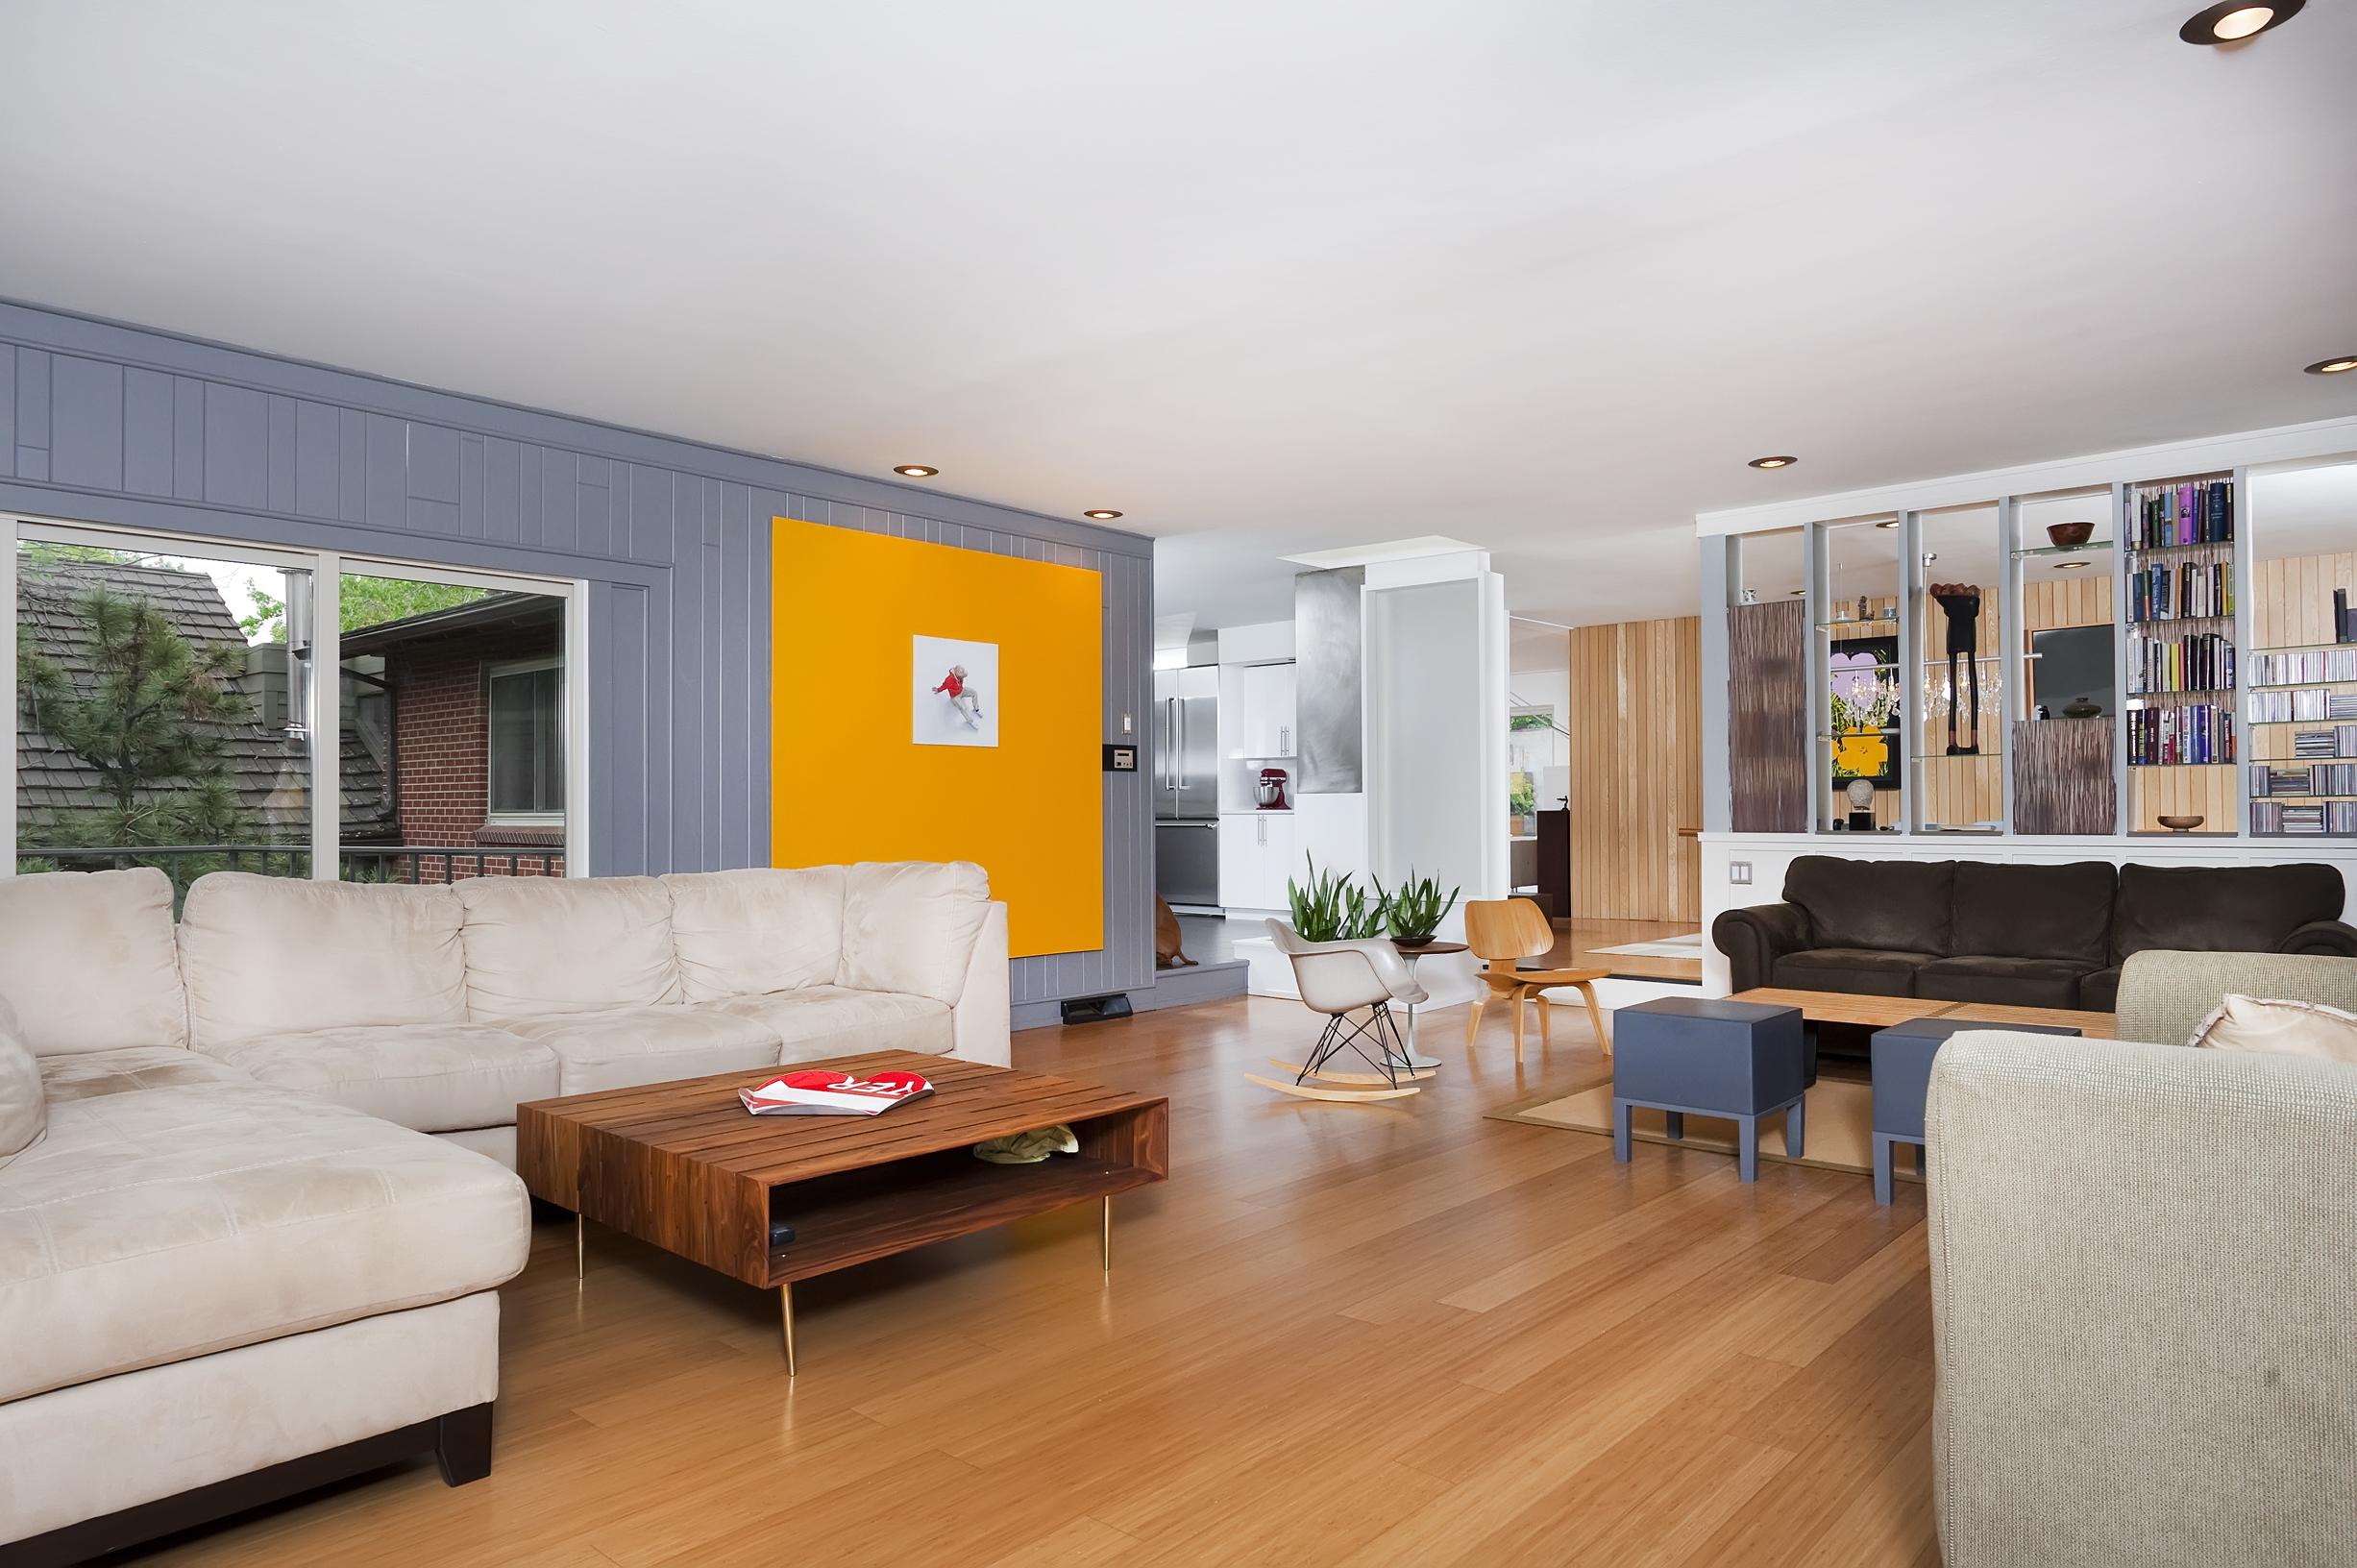 Denver modern architecture firm dean ricci architect for New architecture firms